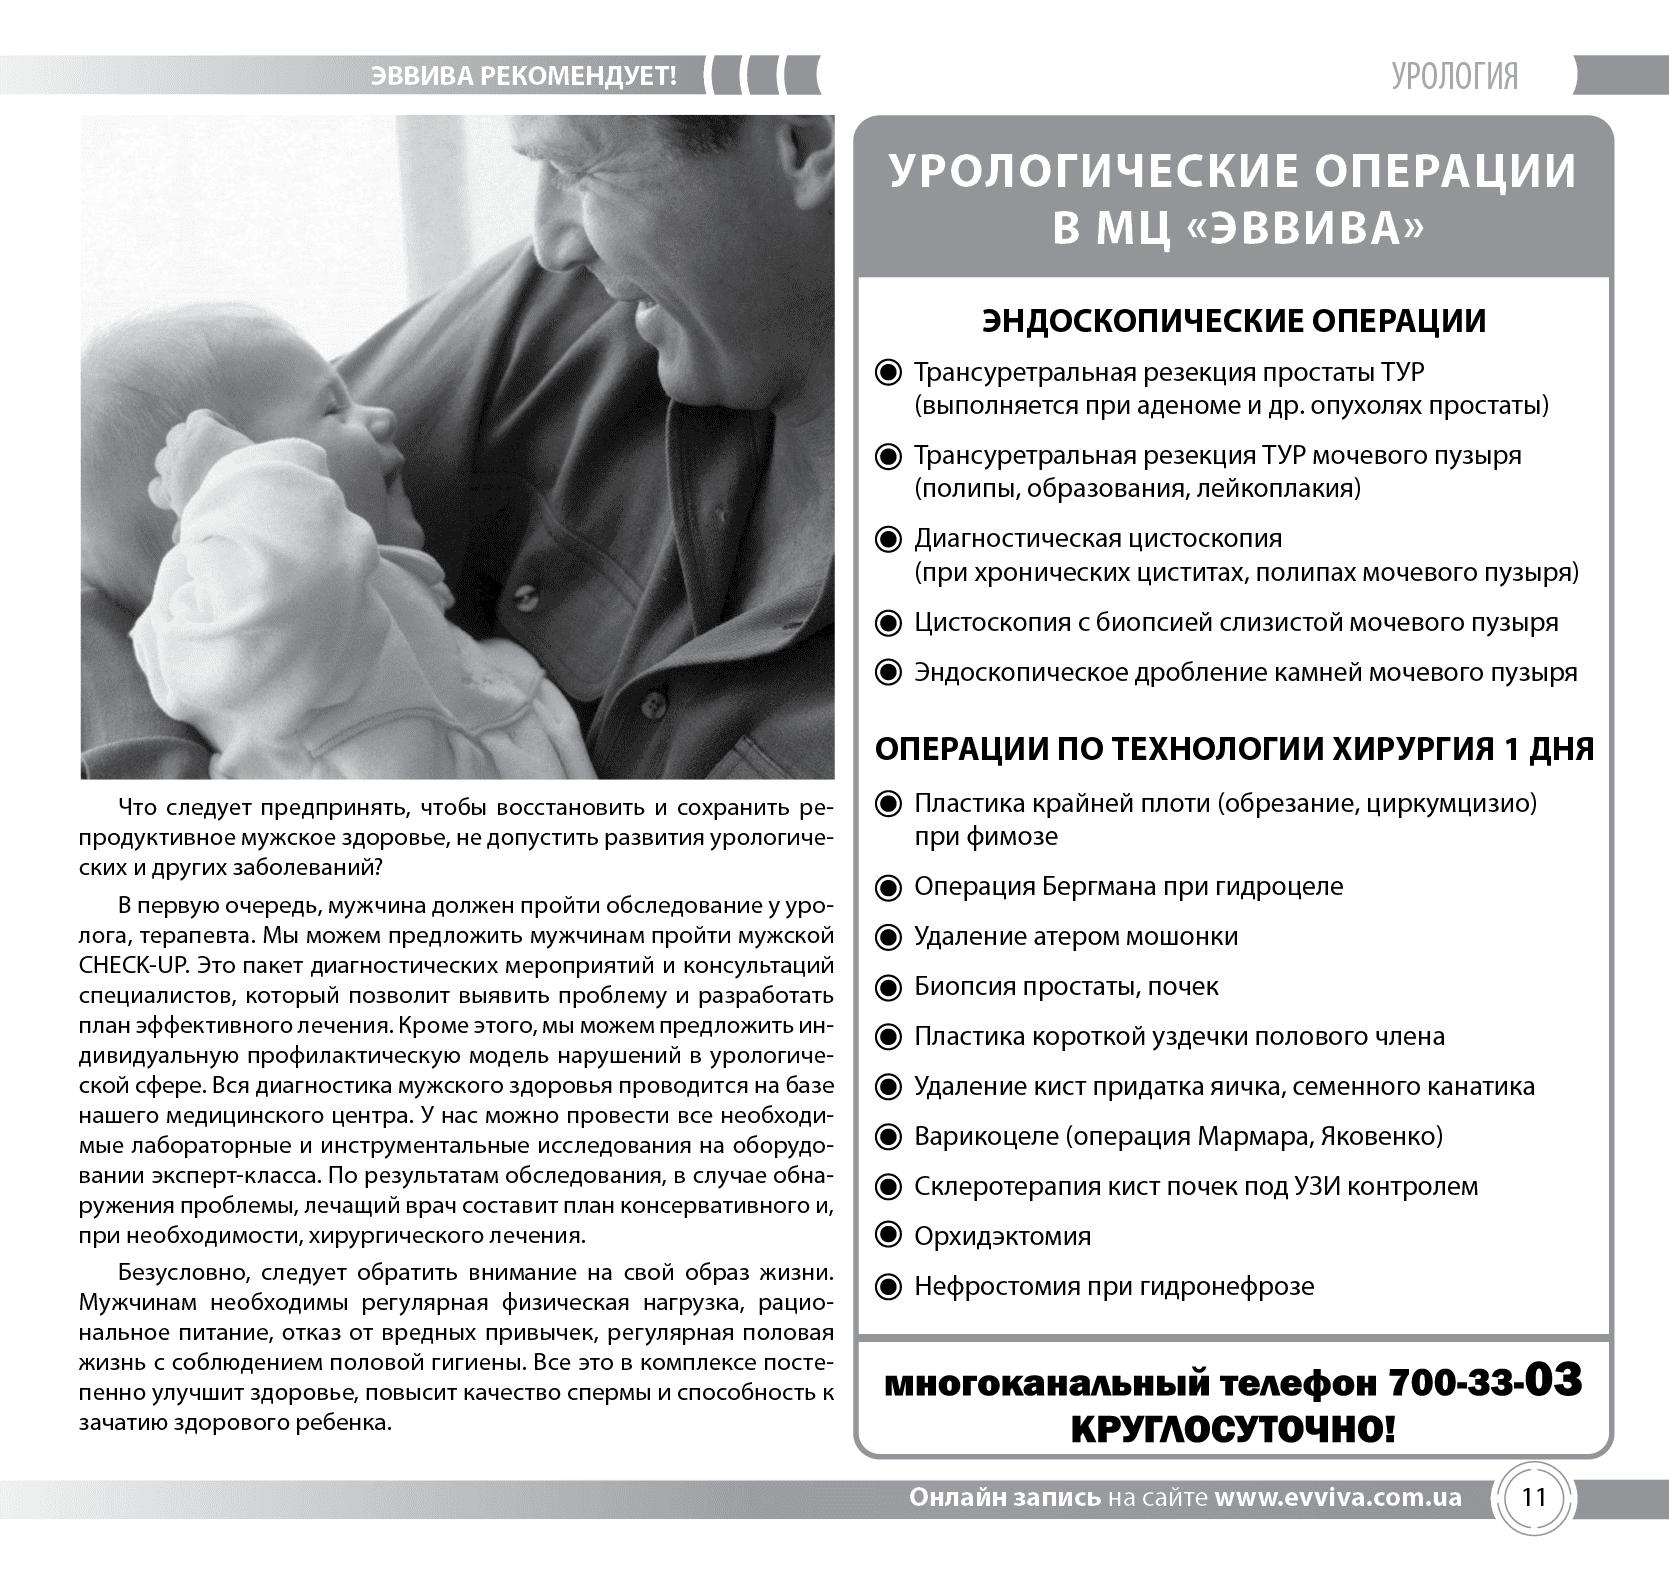 evviva-zhurnal-118-page11